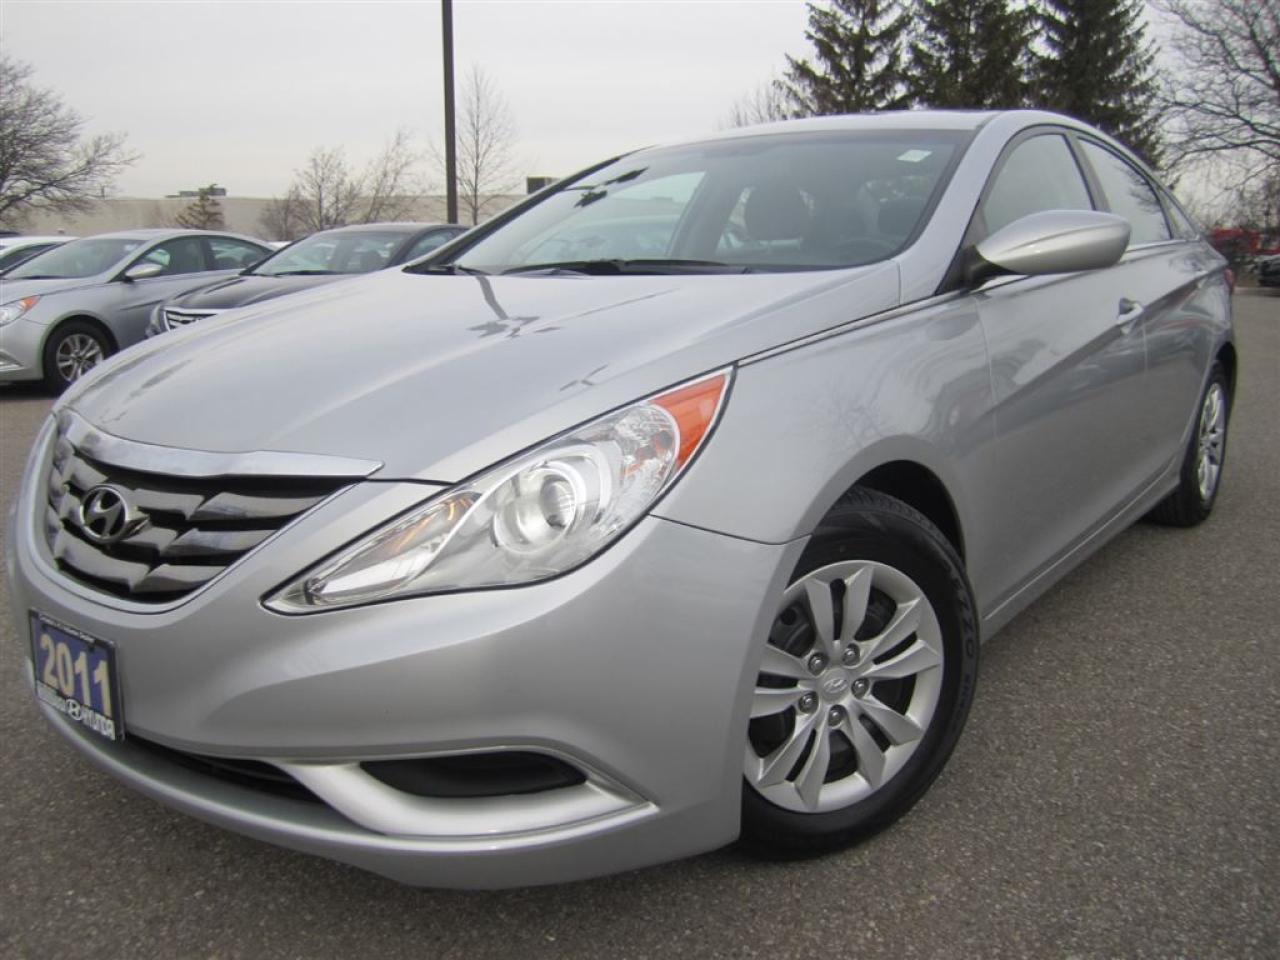 Photo of Silver 2011 Hyundai Sonata